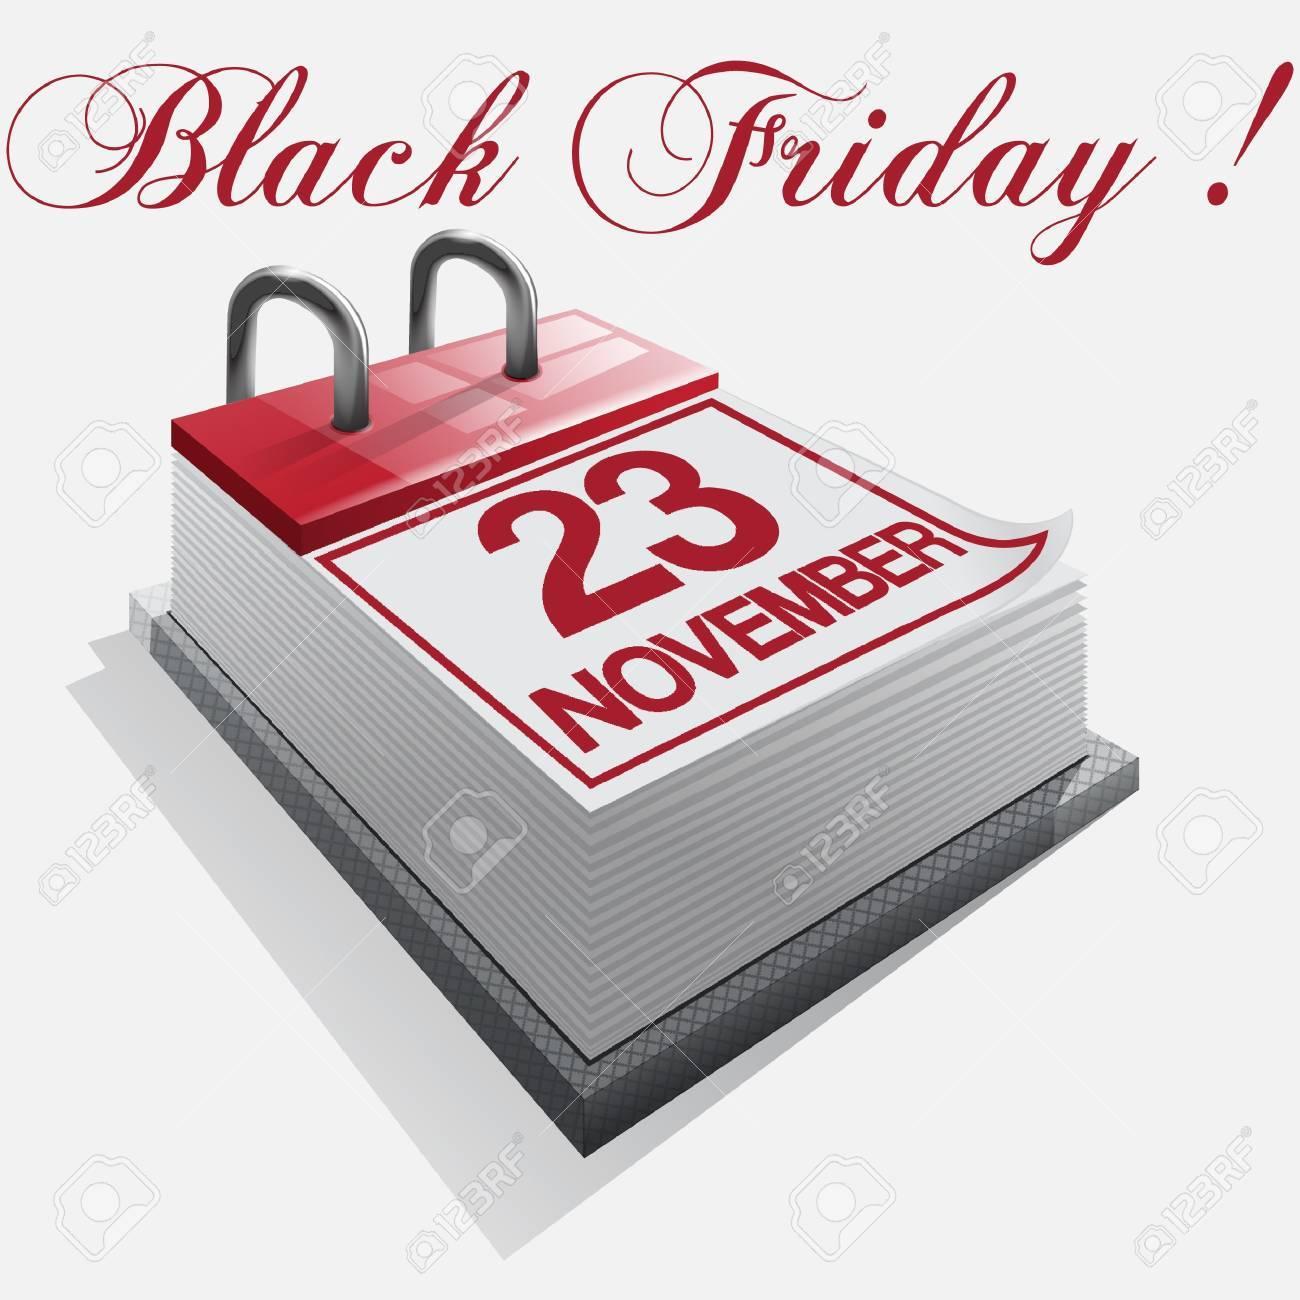 calendar Black friday Stock Vector - 16425922